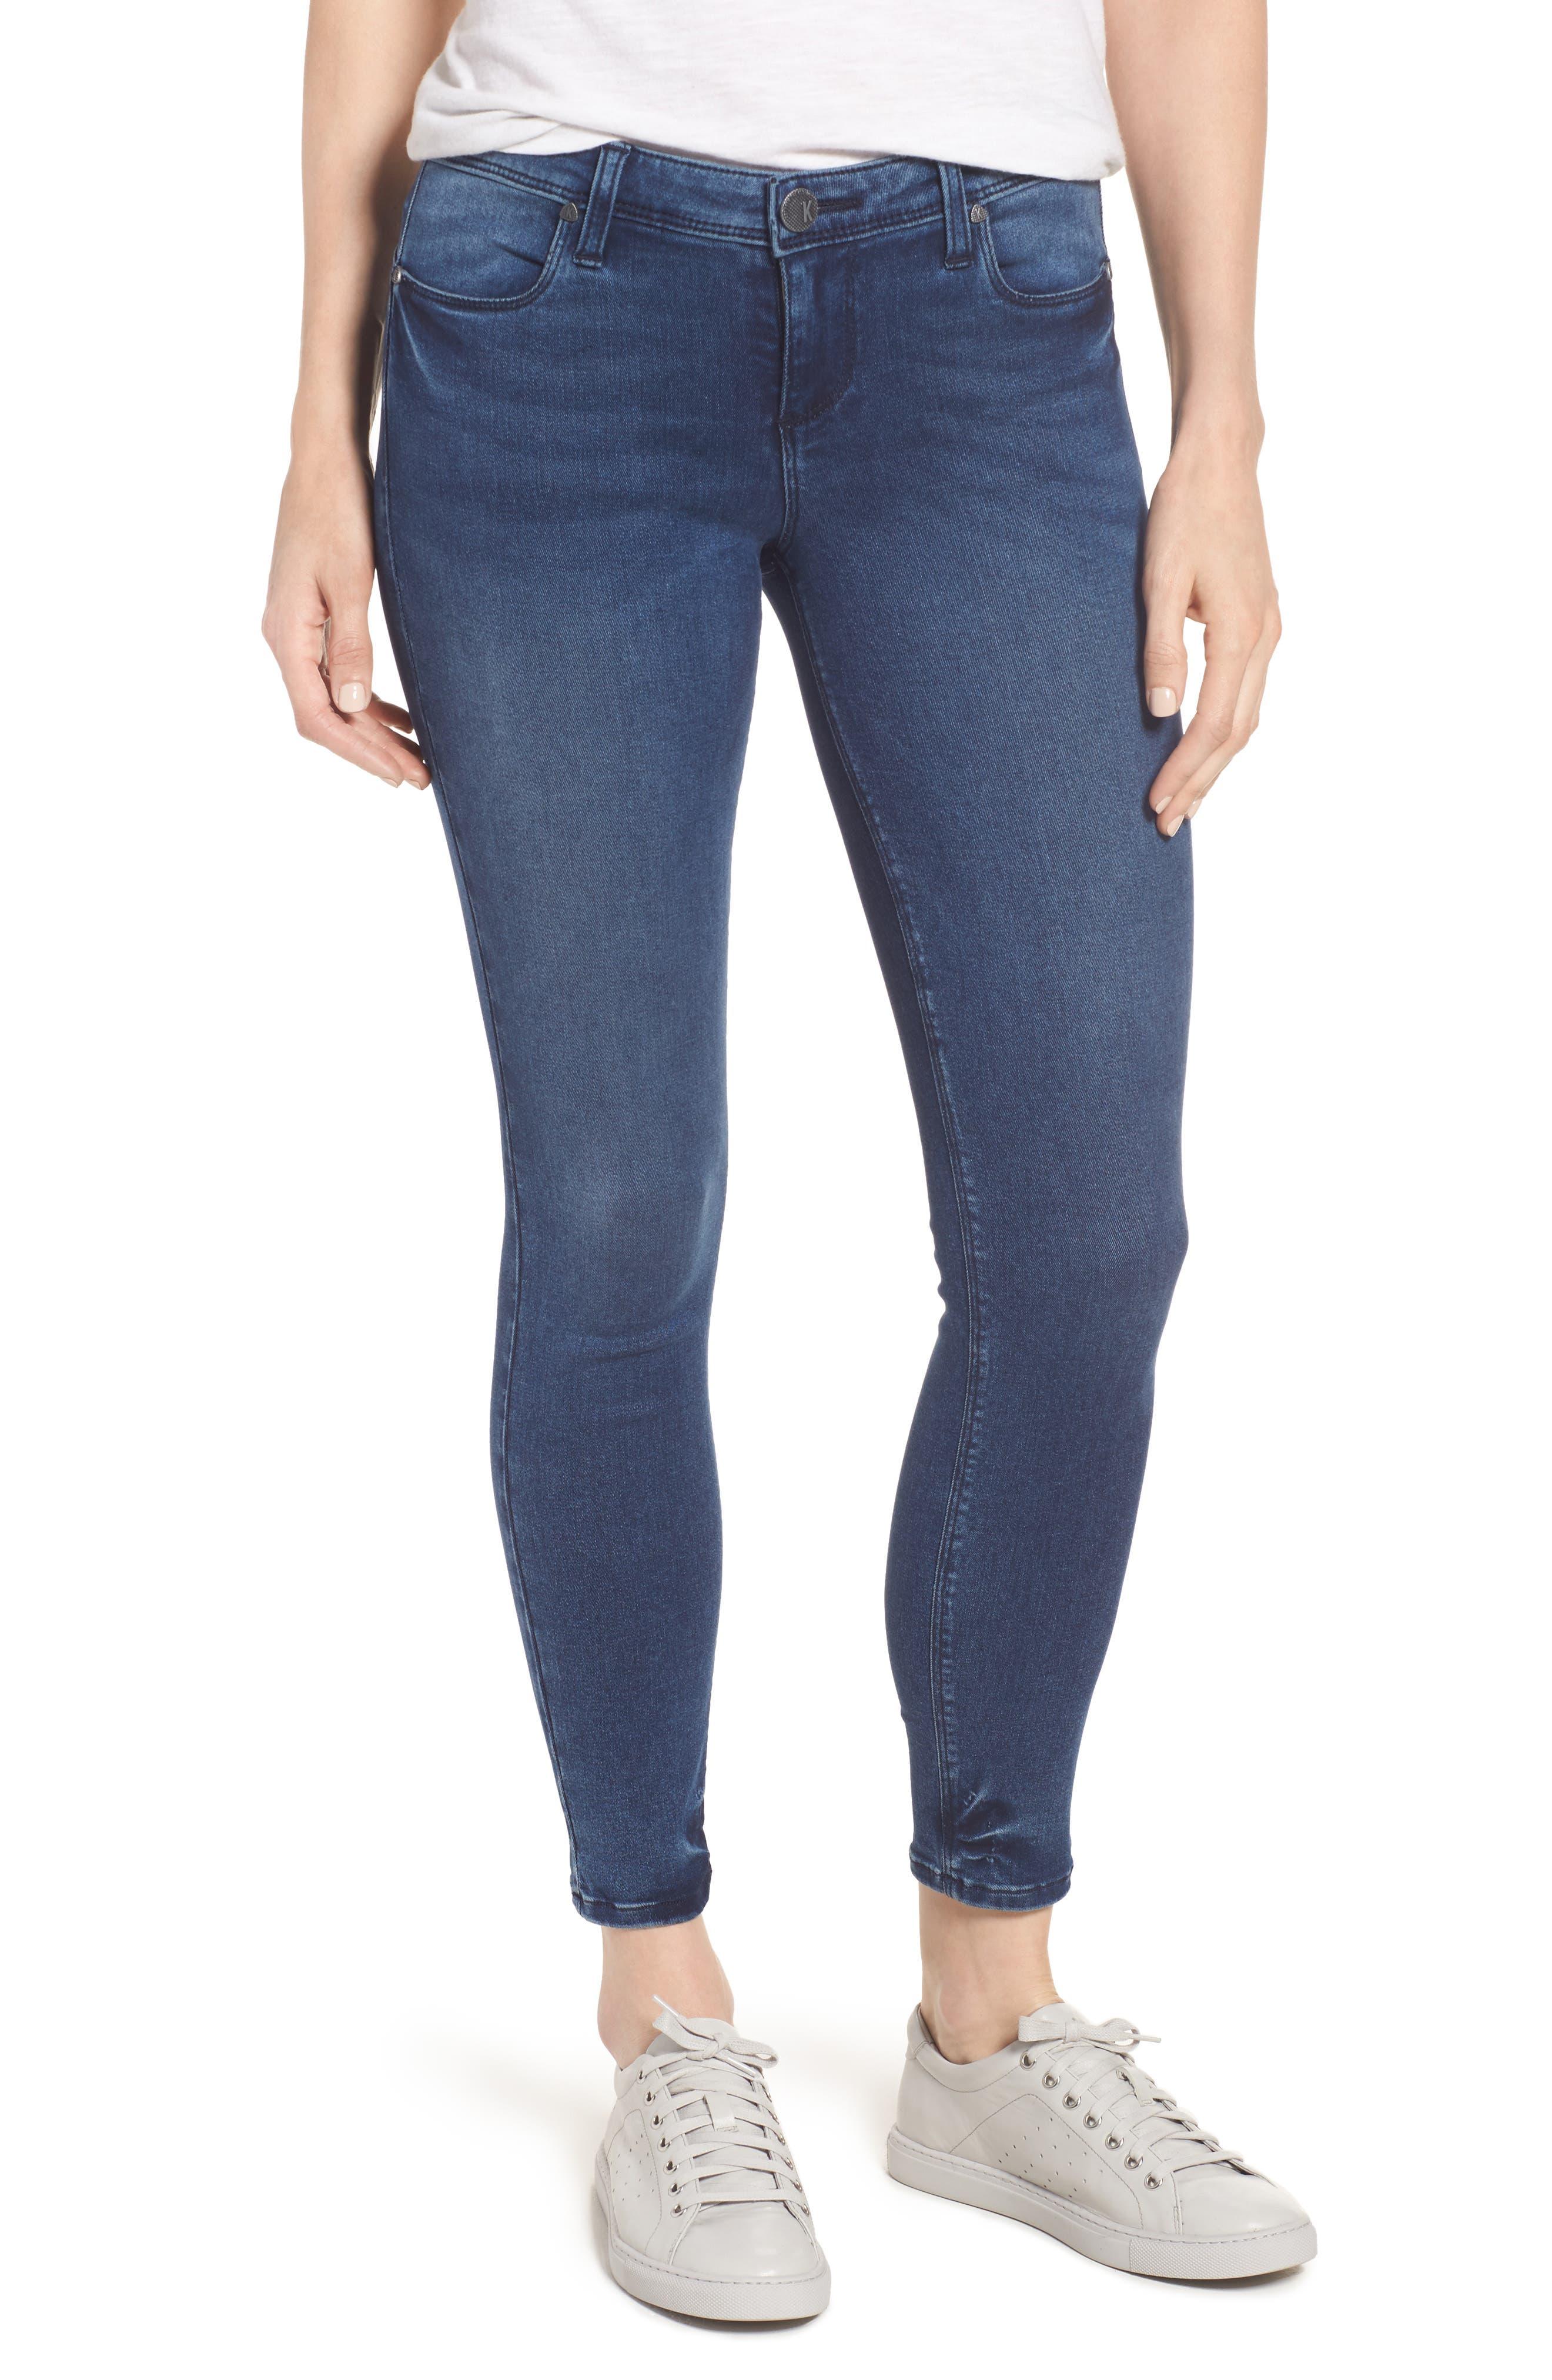 Main Image - KUT from the Kloth Jennifer Ultra Skinny Jeans (Fashionable)